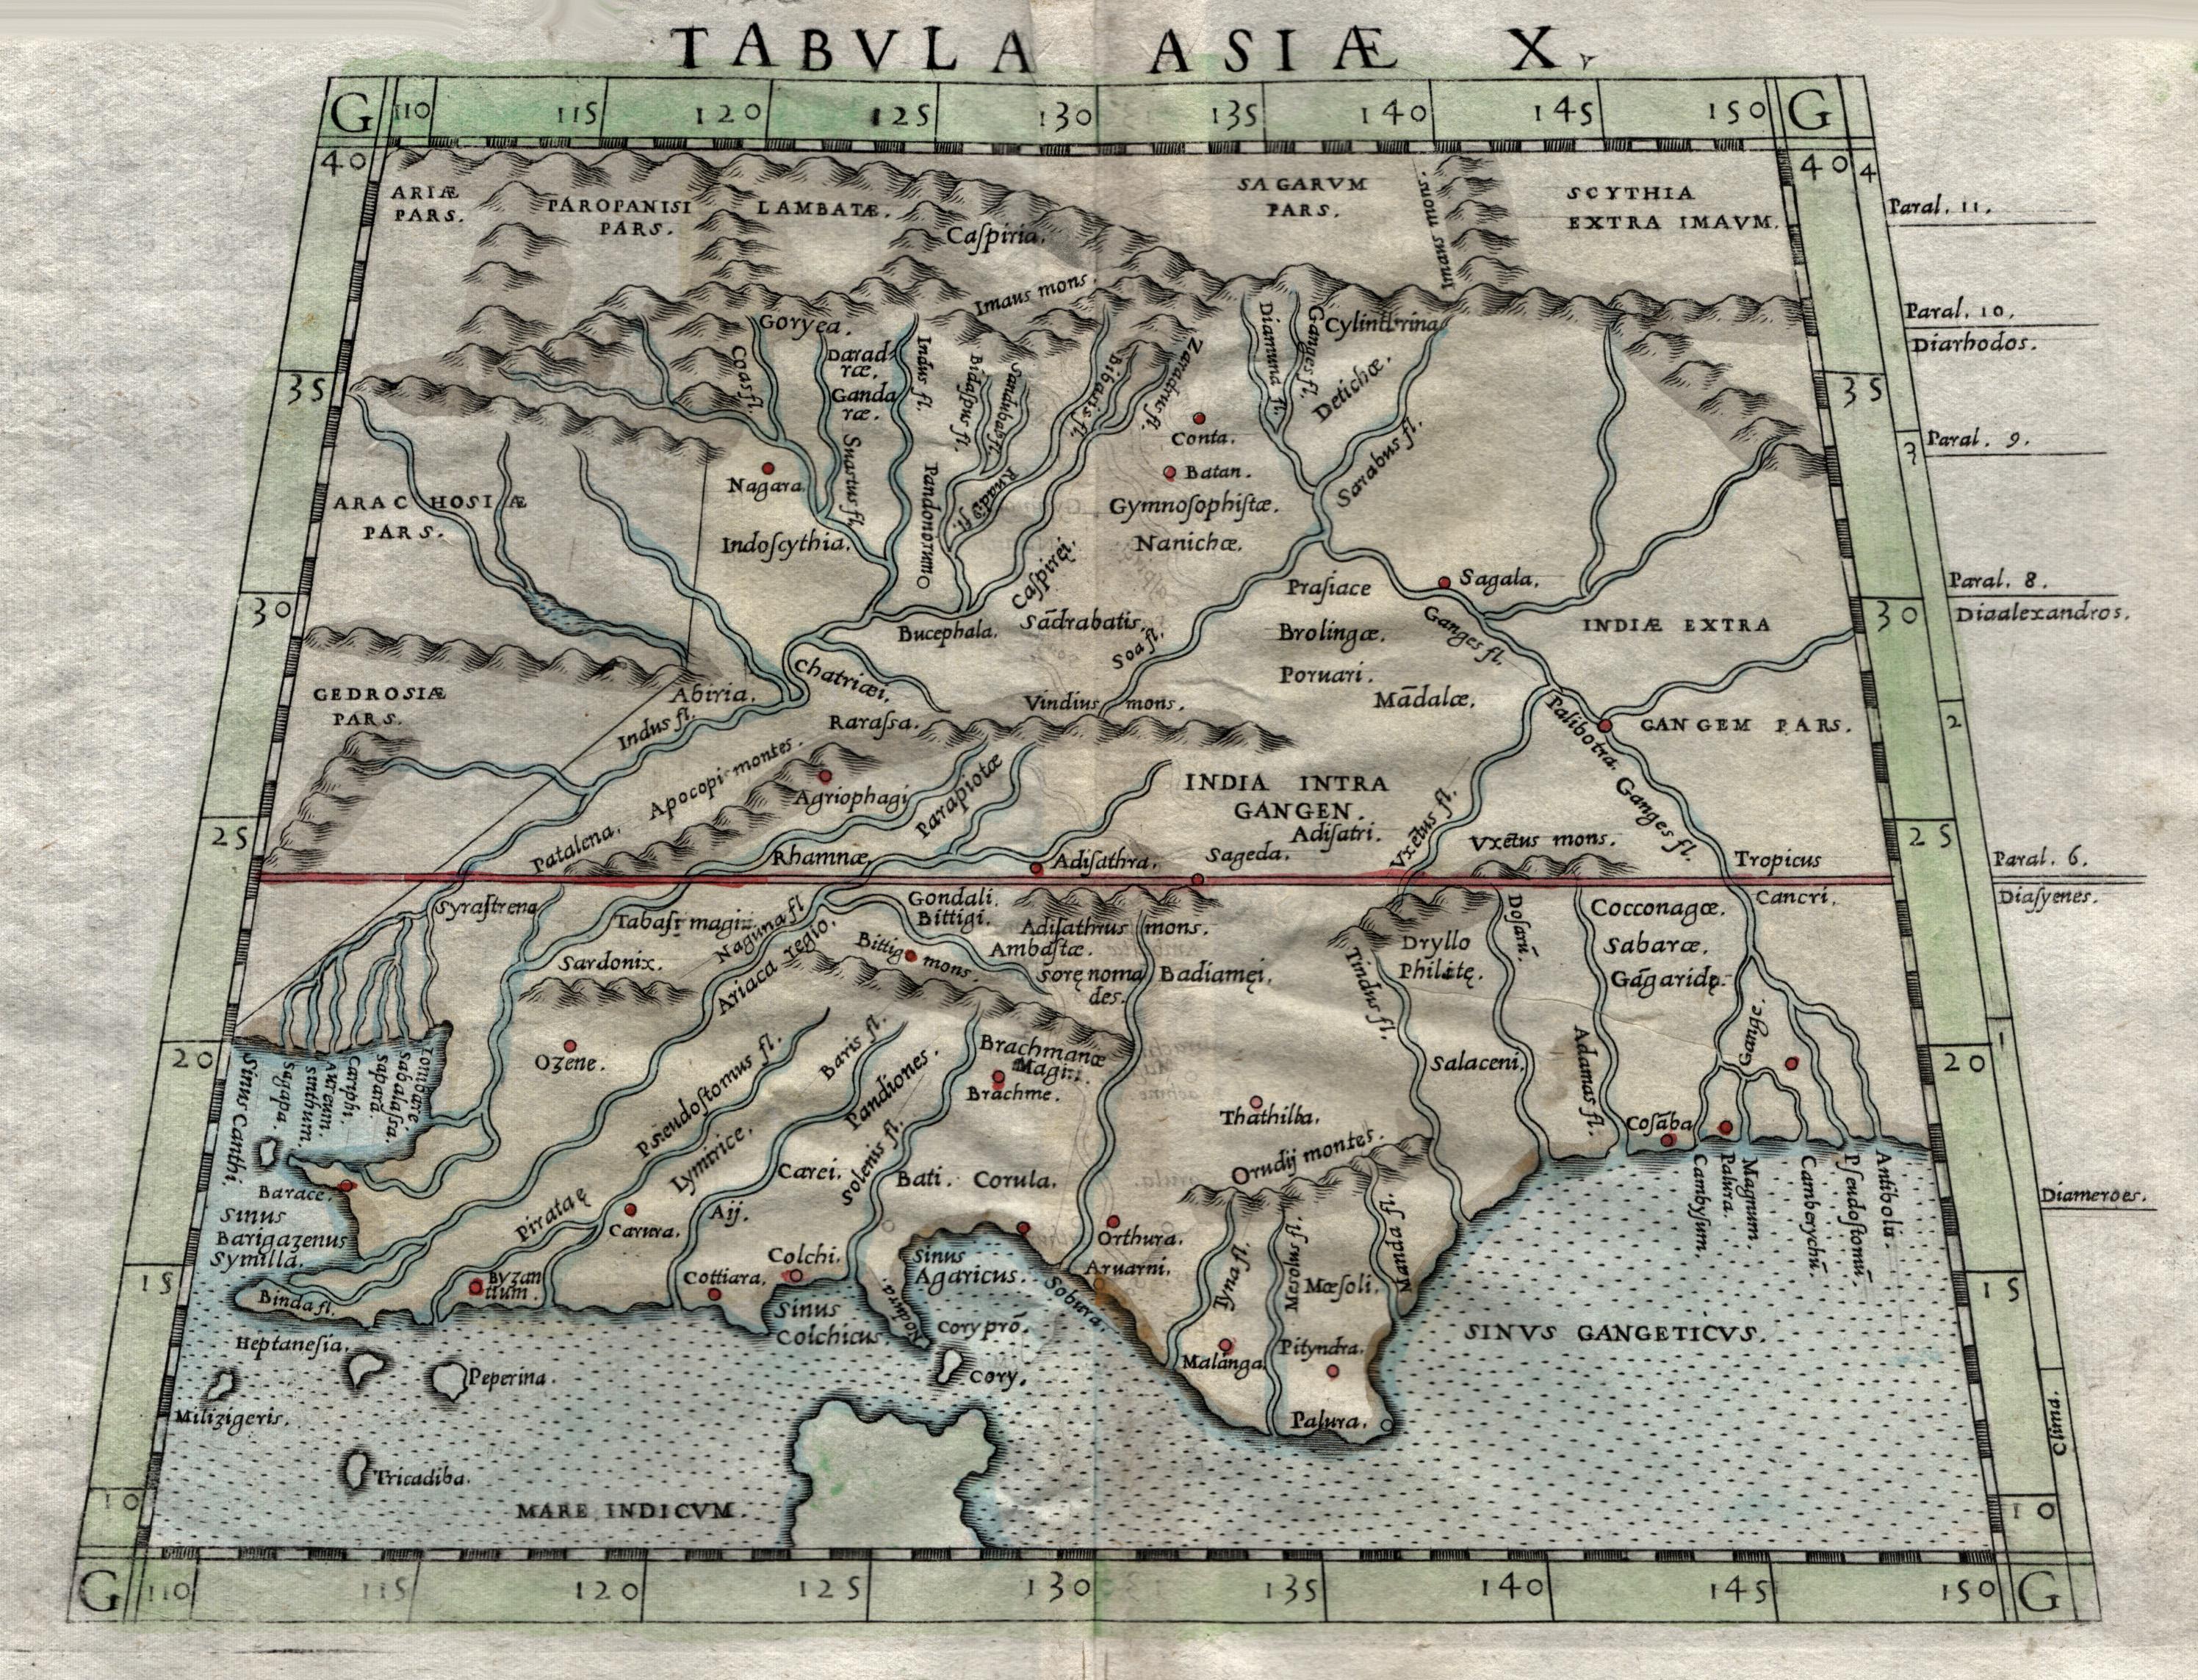 Kst.- Karte, n. Ptolemäus v. Girolamo Ruscelli,: Indien ( India